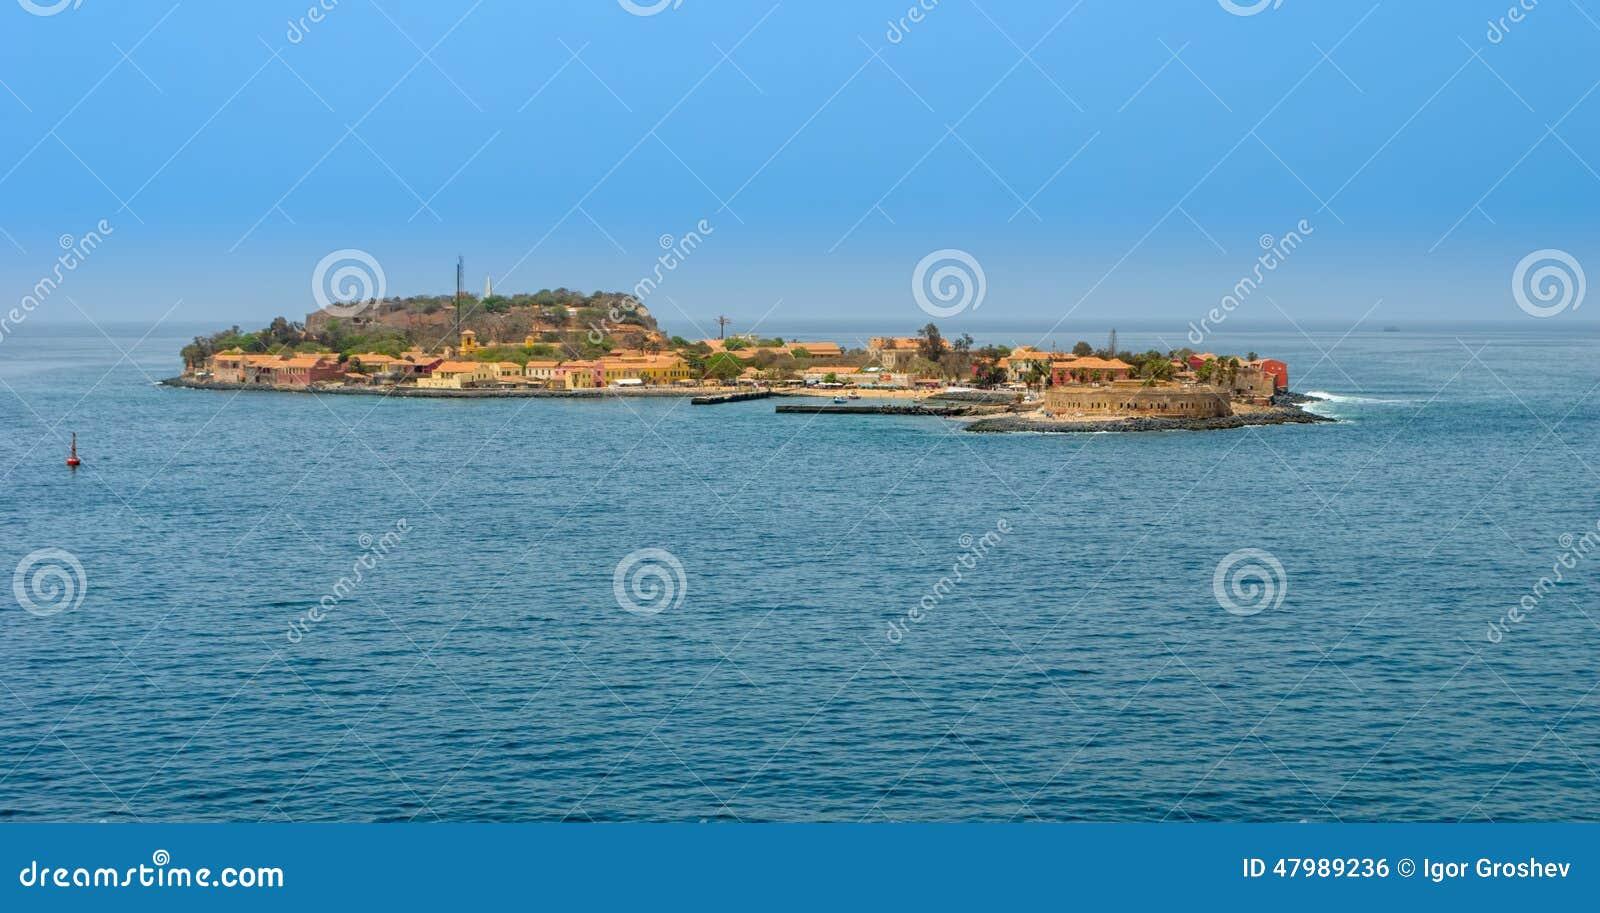 Île de Goree, Sénégal